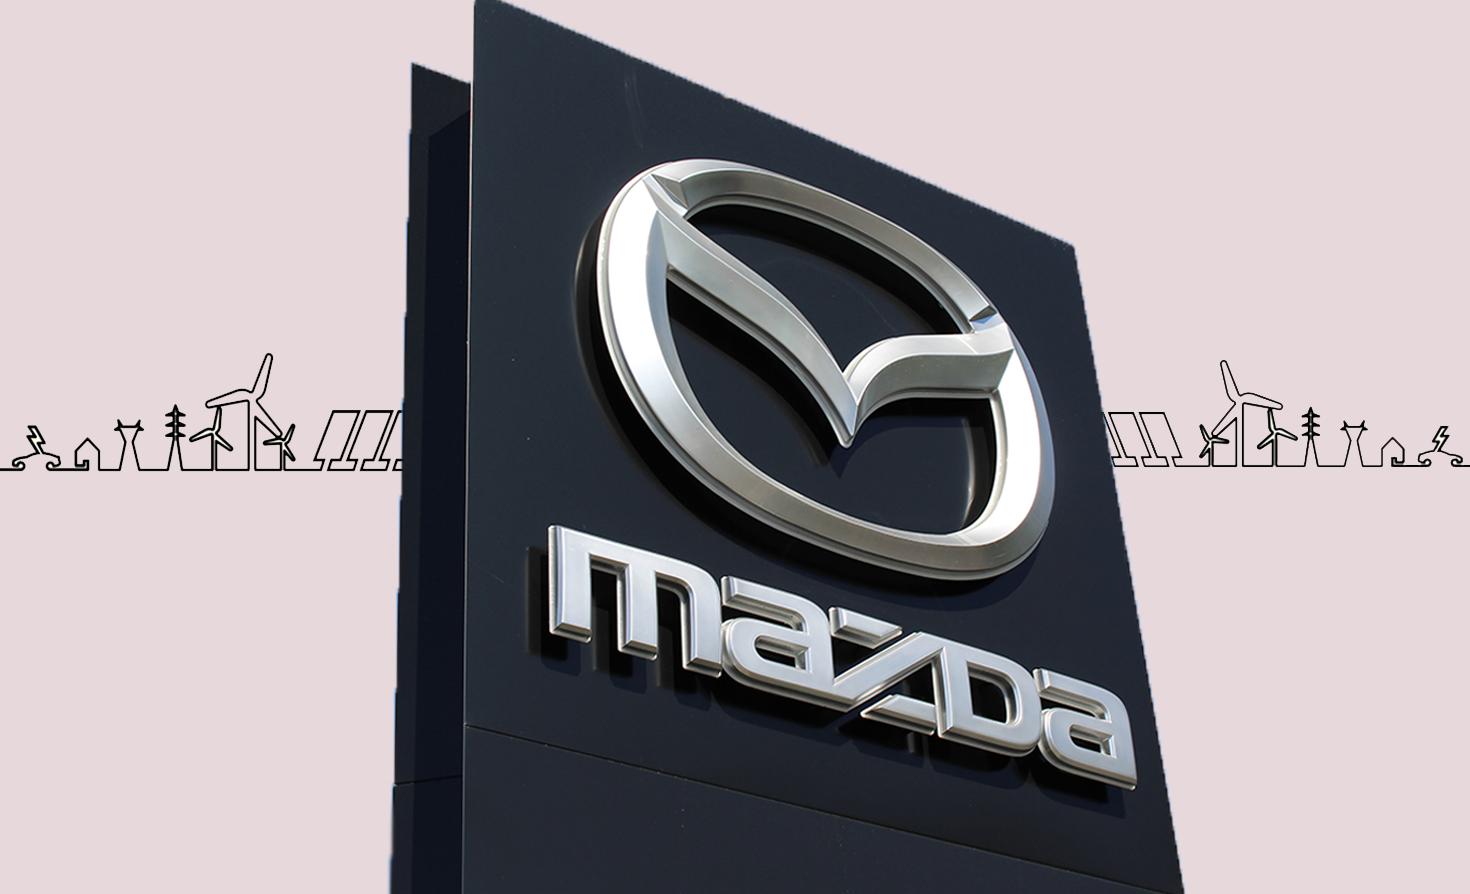 Kelebihan Zoom Zoom Mazda Tangguh